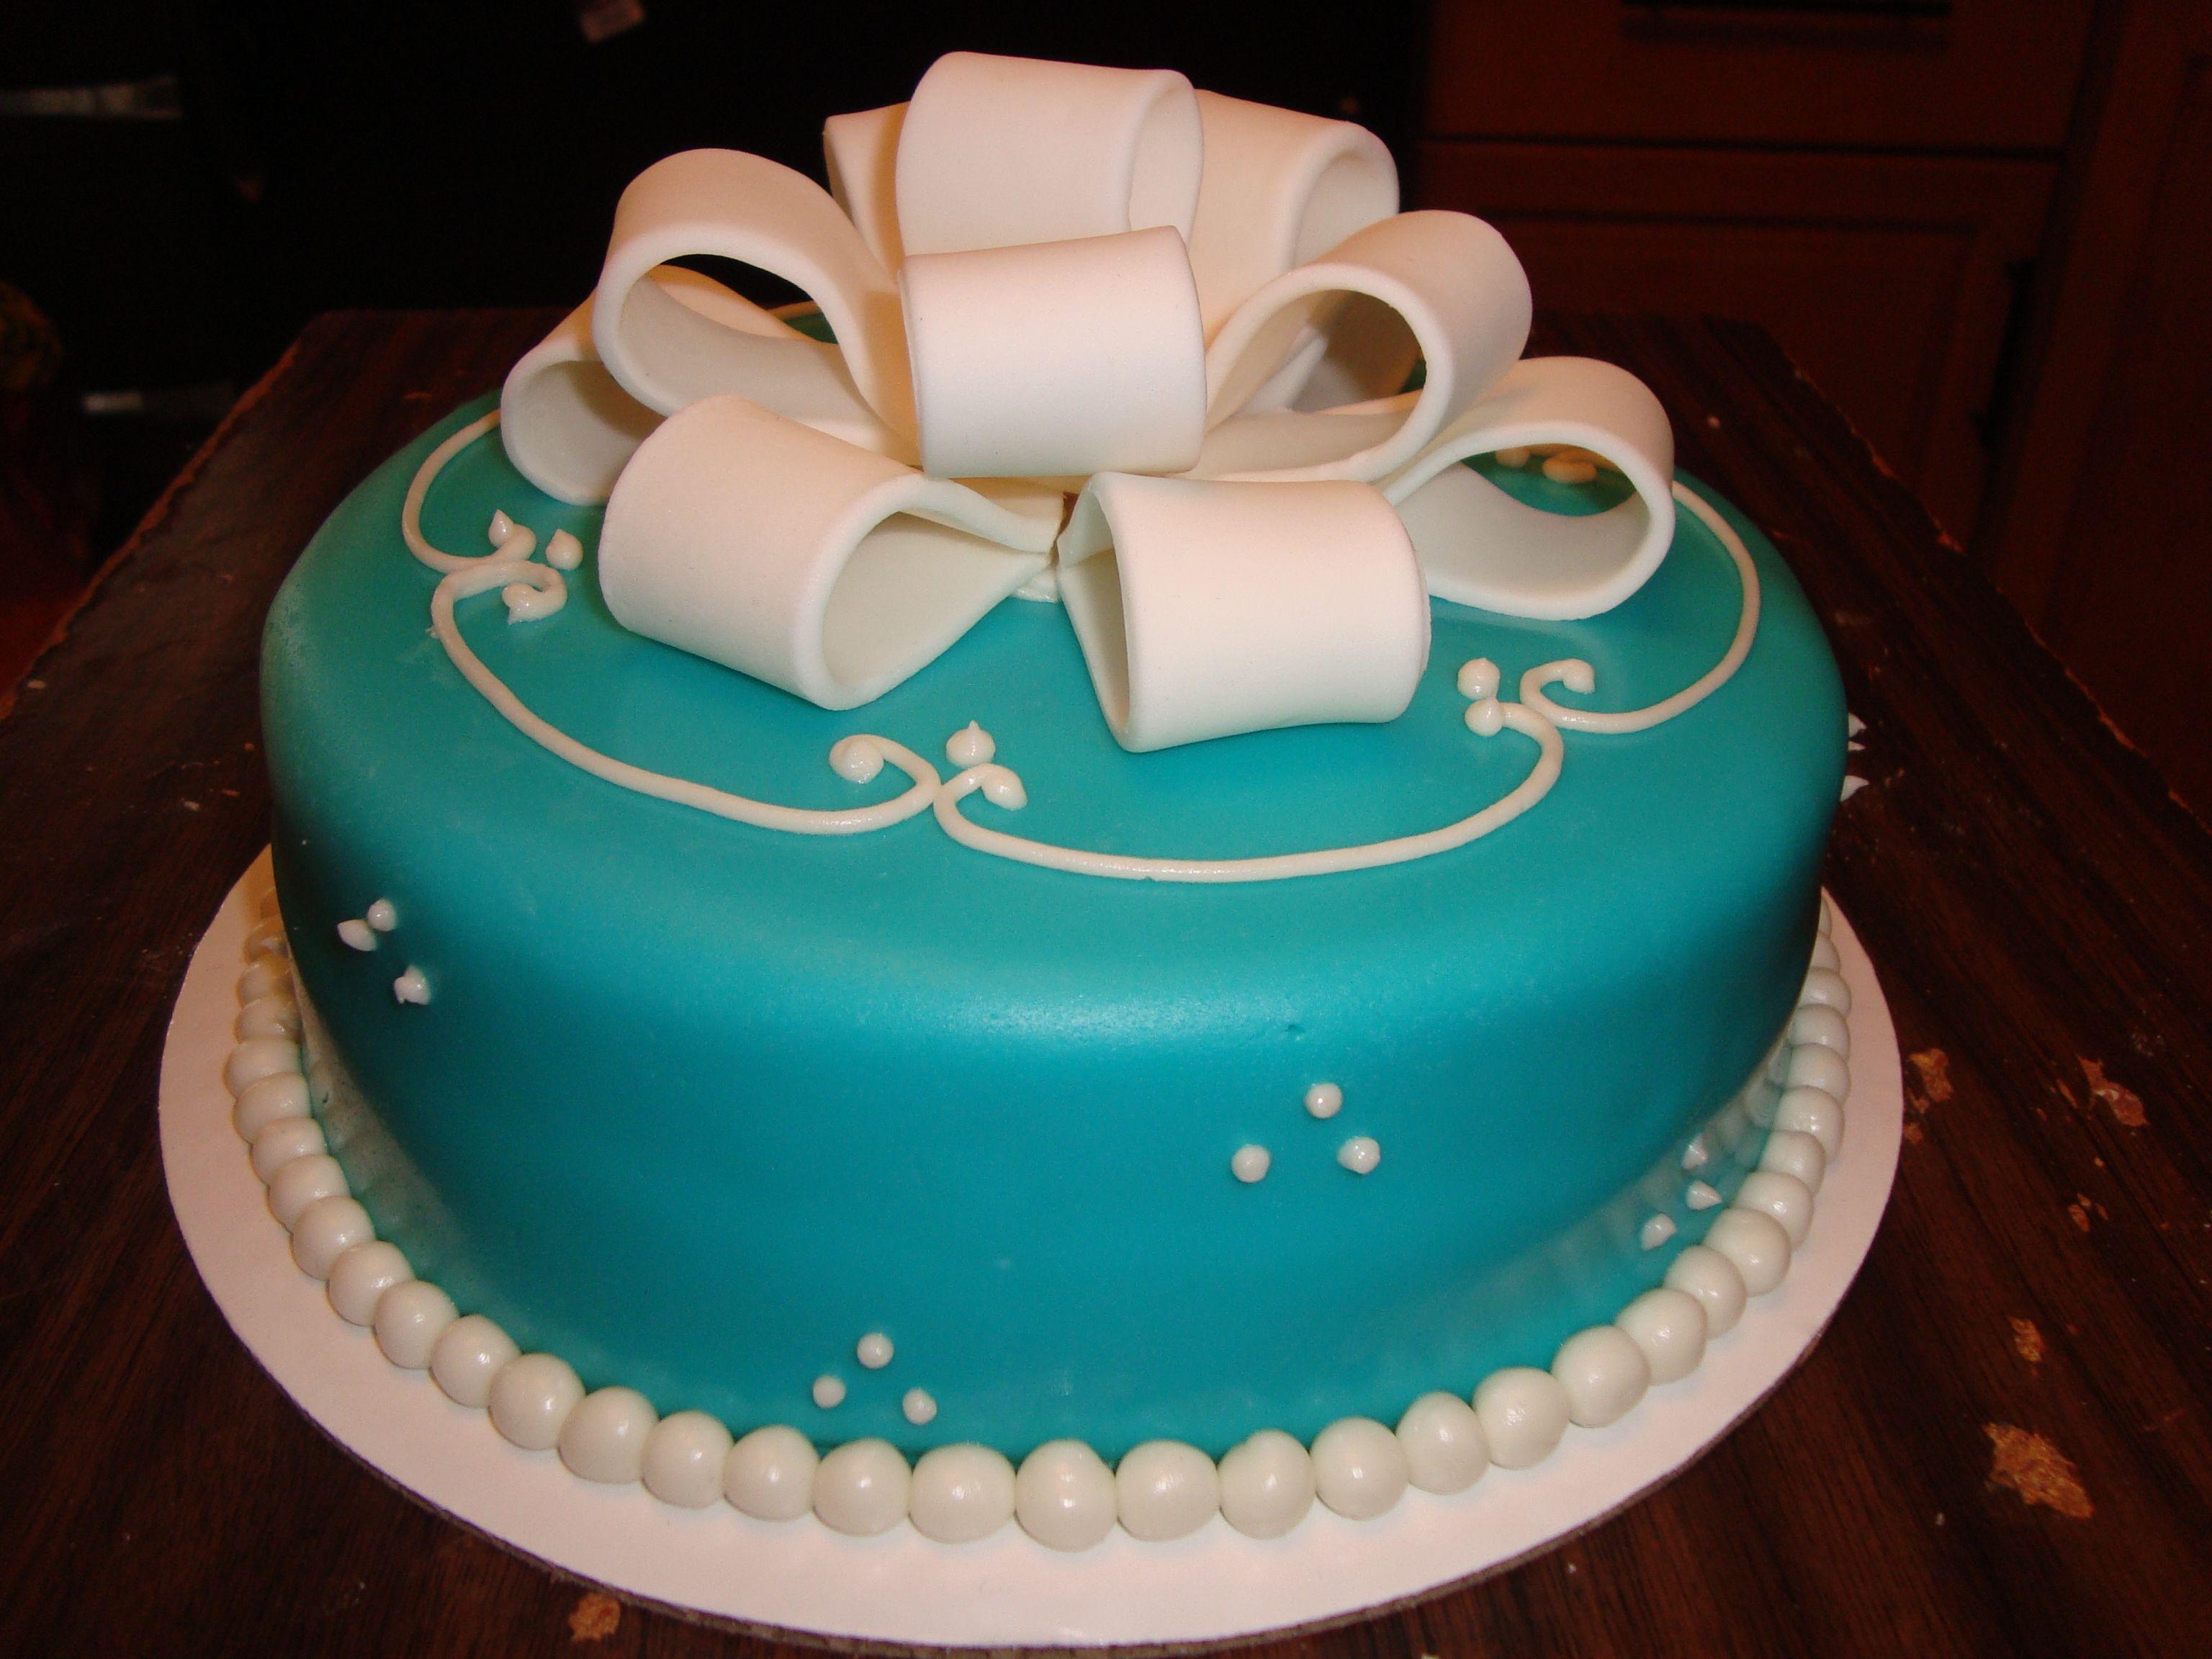 wiltoncontest Michaels El Centro CA Course 3 Cake 1 My Wilton